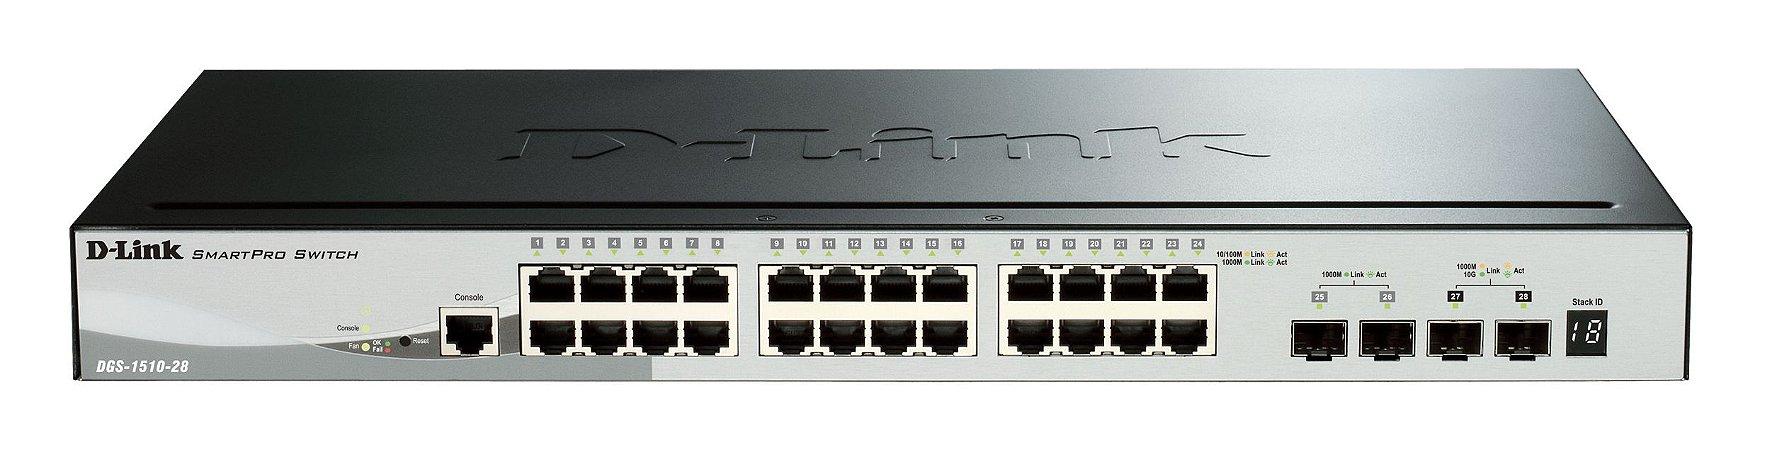 Switch D-Link 24 Portas Gerenciáveis 10/100/1000, 2 Sfp 2 10g Sfp - Dgs-1510-28